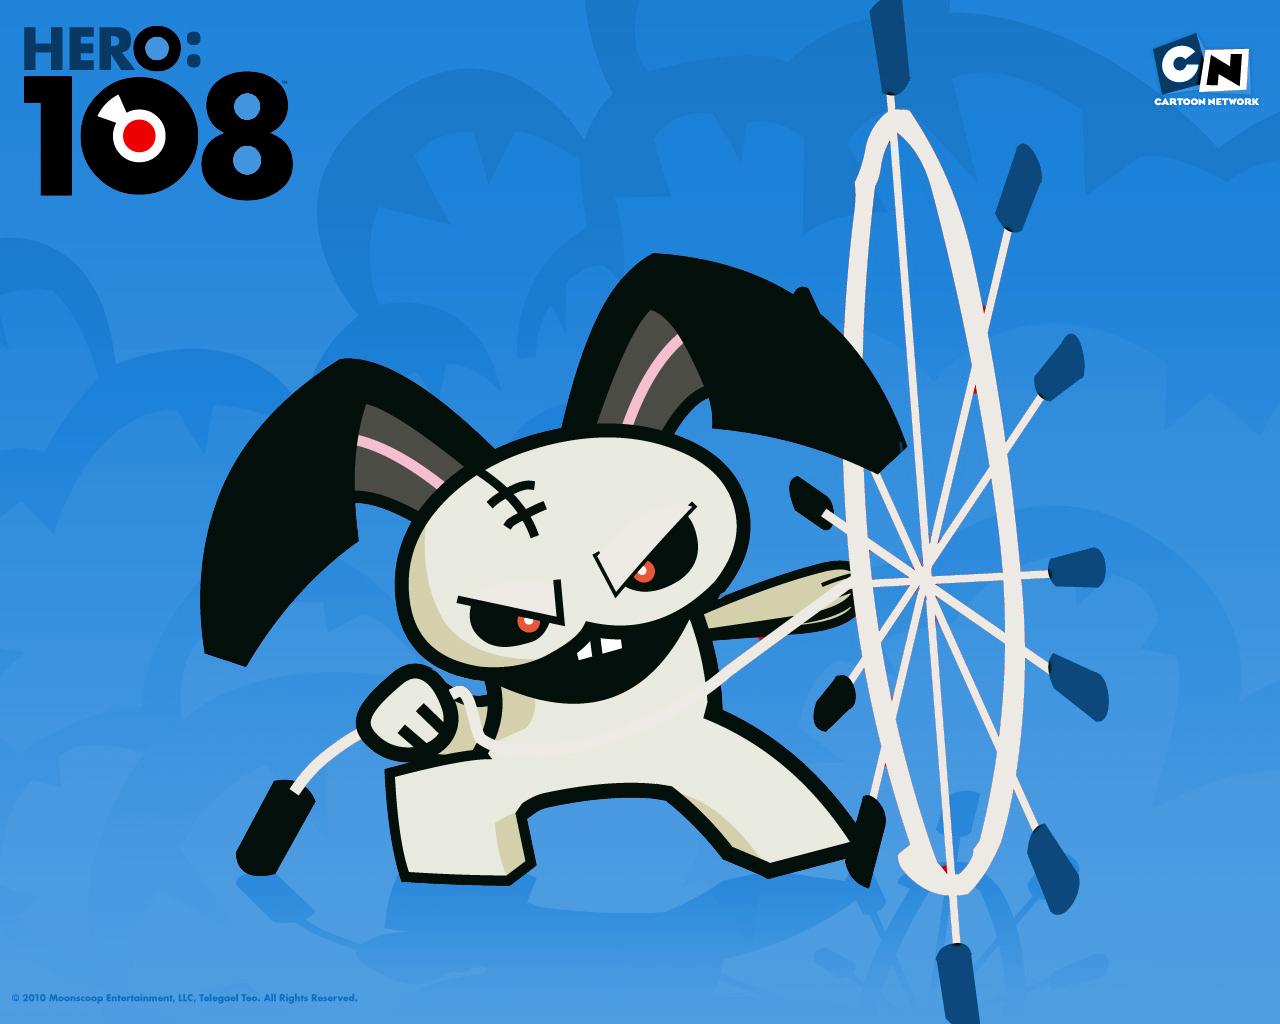 Hero 108 Characters Cartoon Network Hd Wallpapers Cartoon Wallpapers